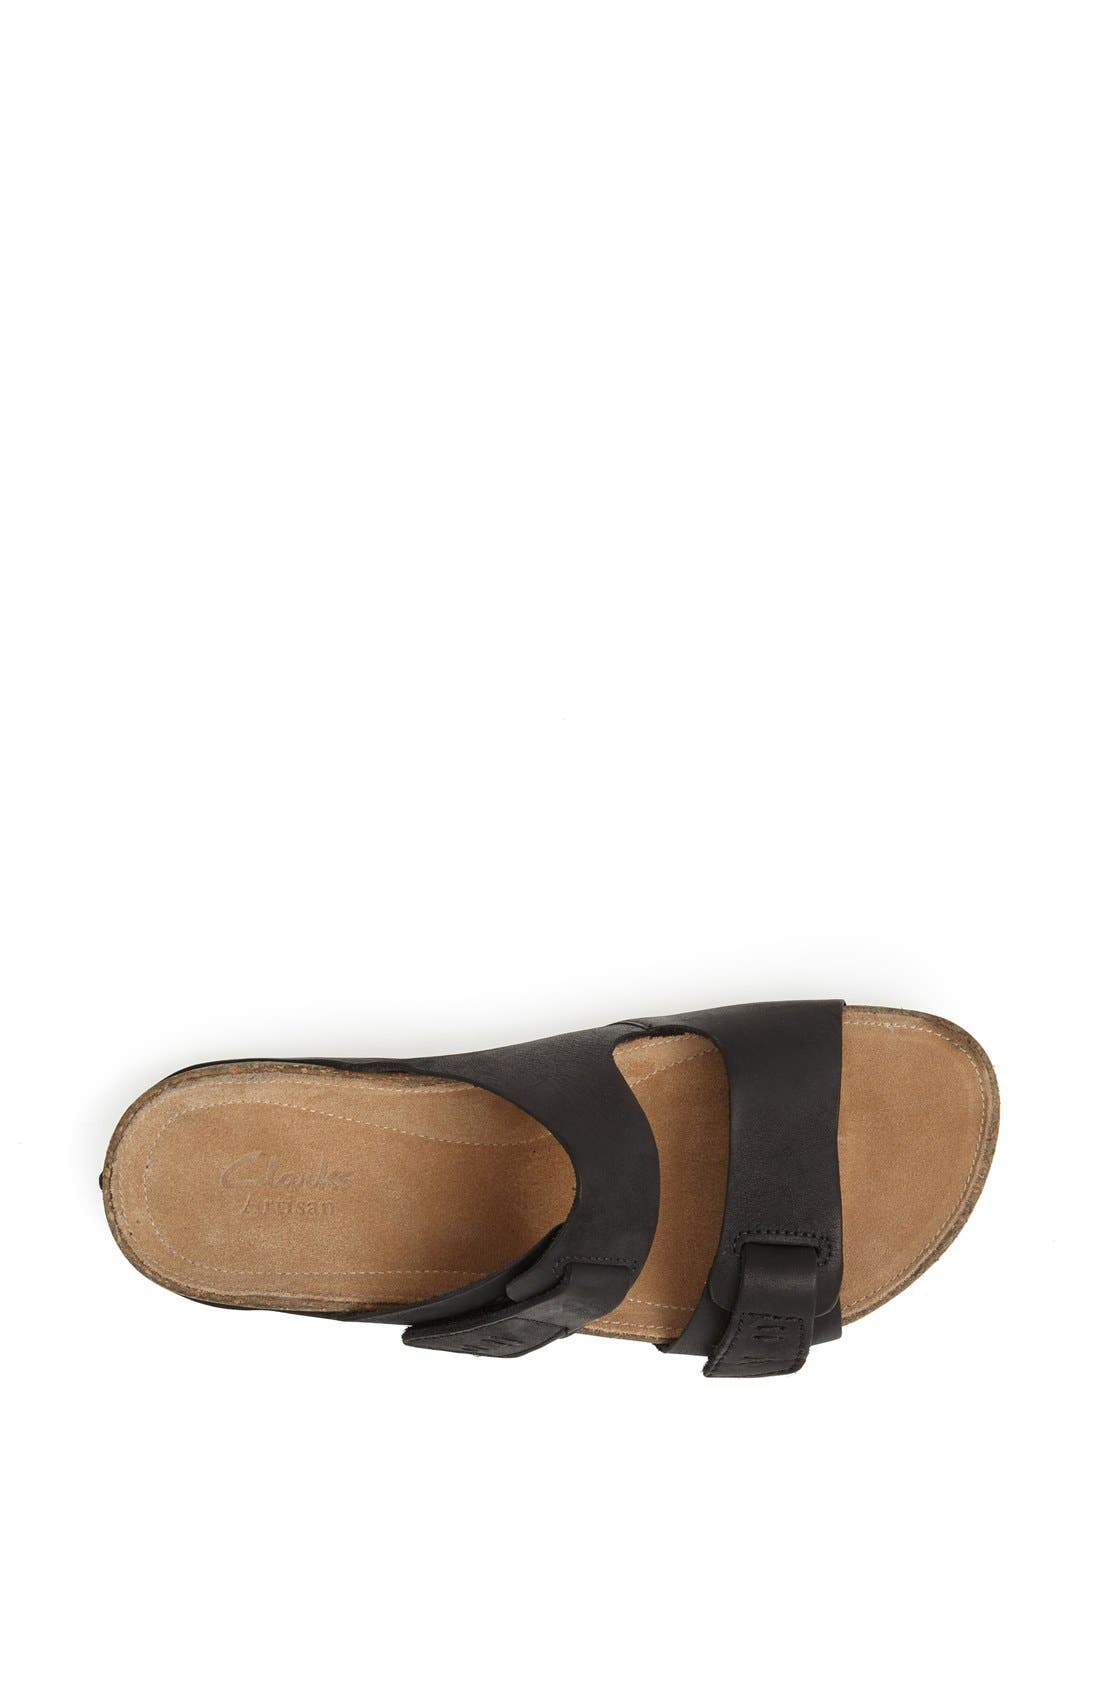 'Perri Coast' Leather Thong Sandal,                             Alternate thumbnail 4, color,                             005